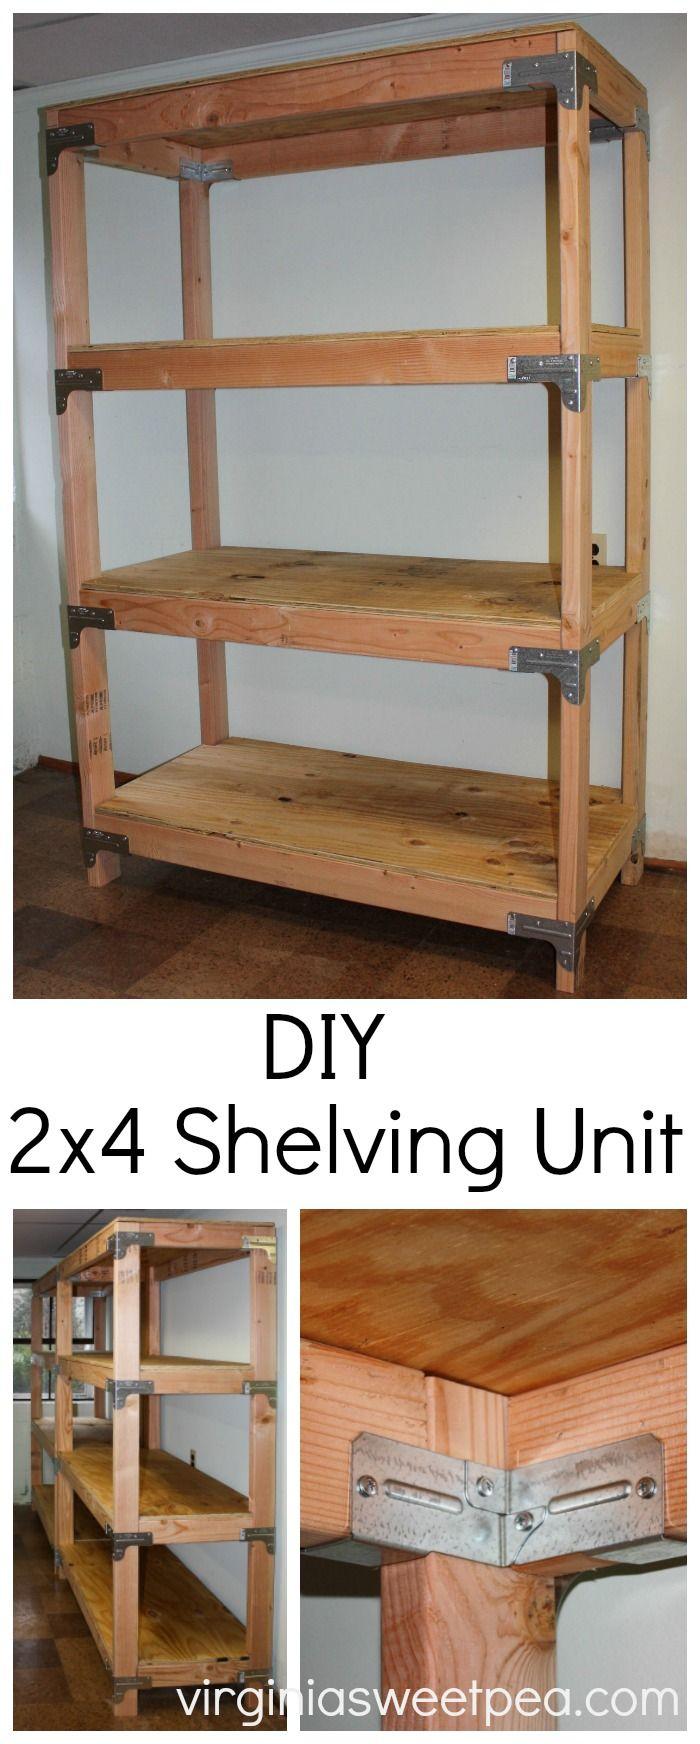 DIY 2x4 Shelving Unit Home remodeling diy, Wood shelving